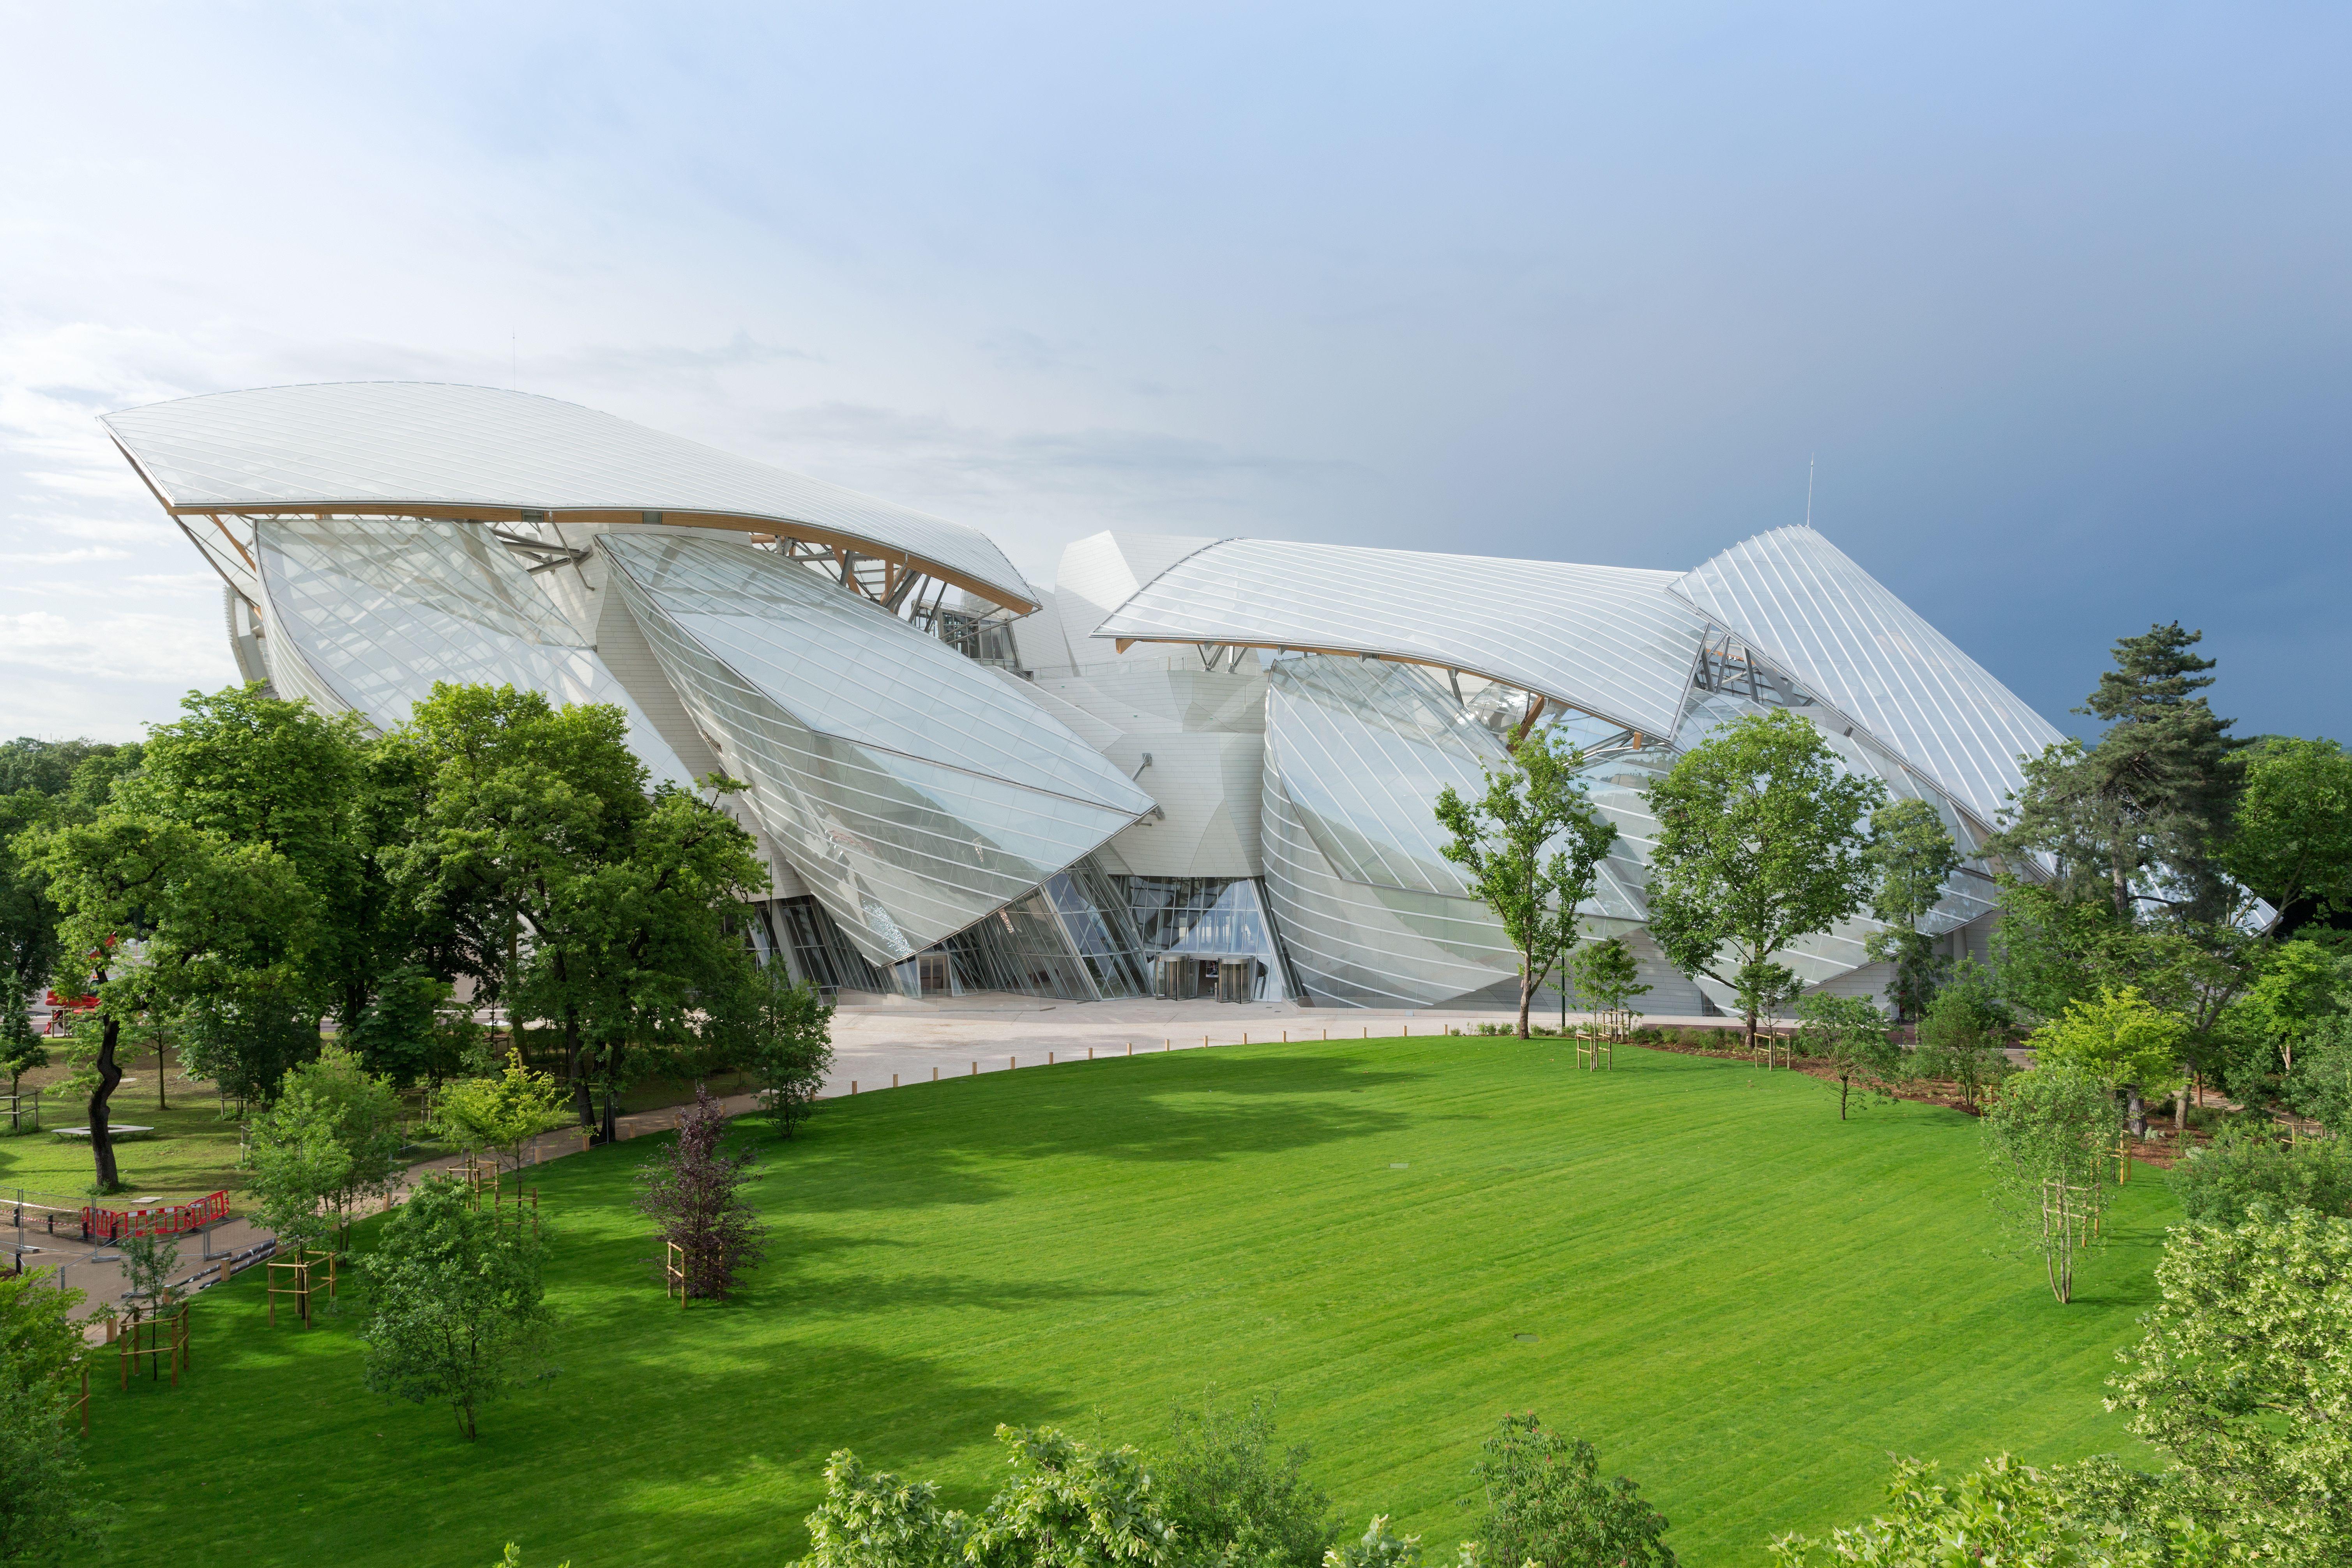 2. The Fondation Louis Vuitton © Iwan Baan